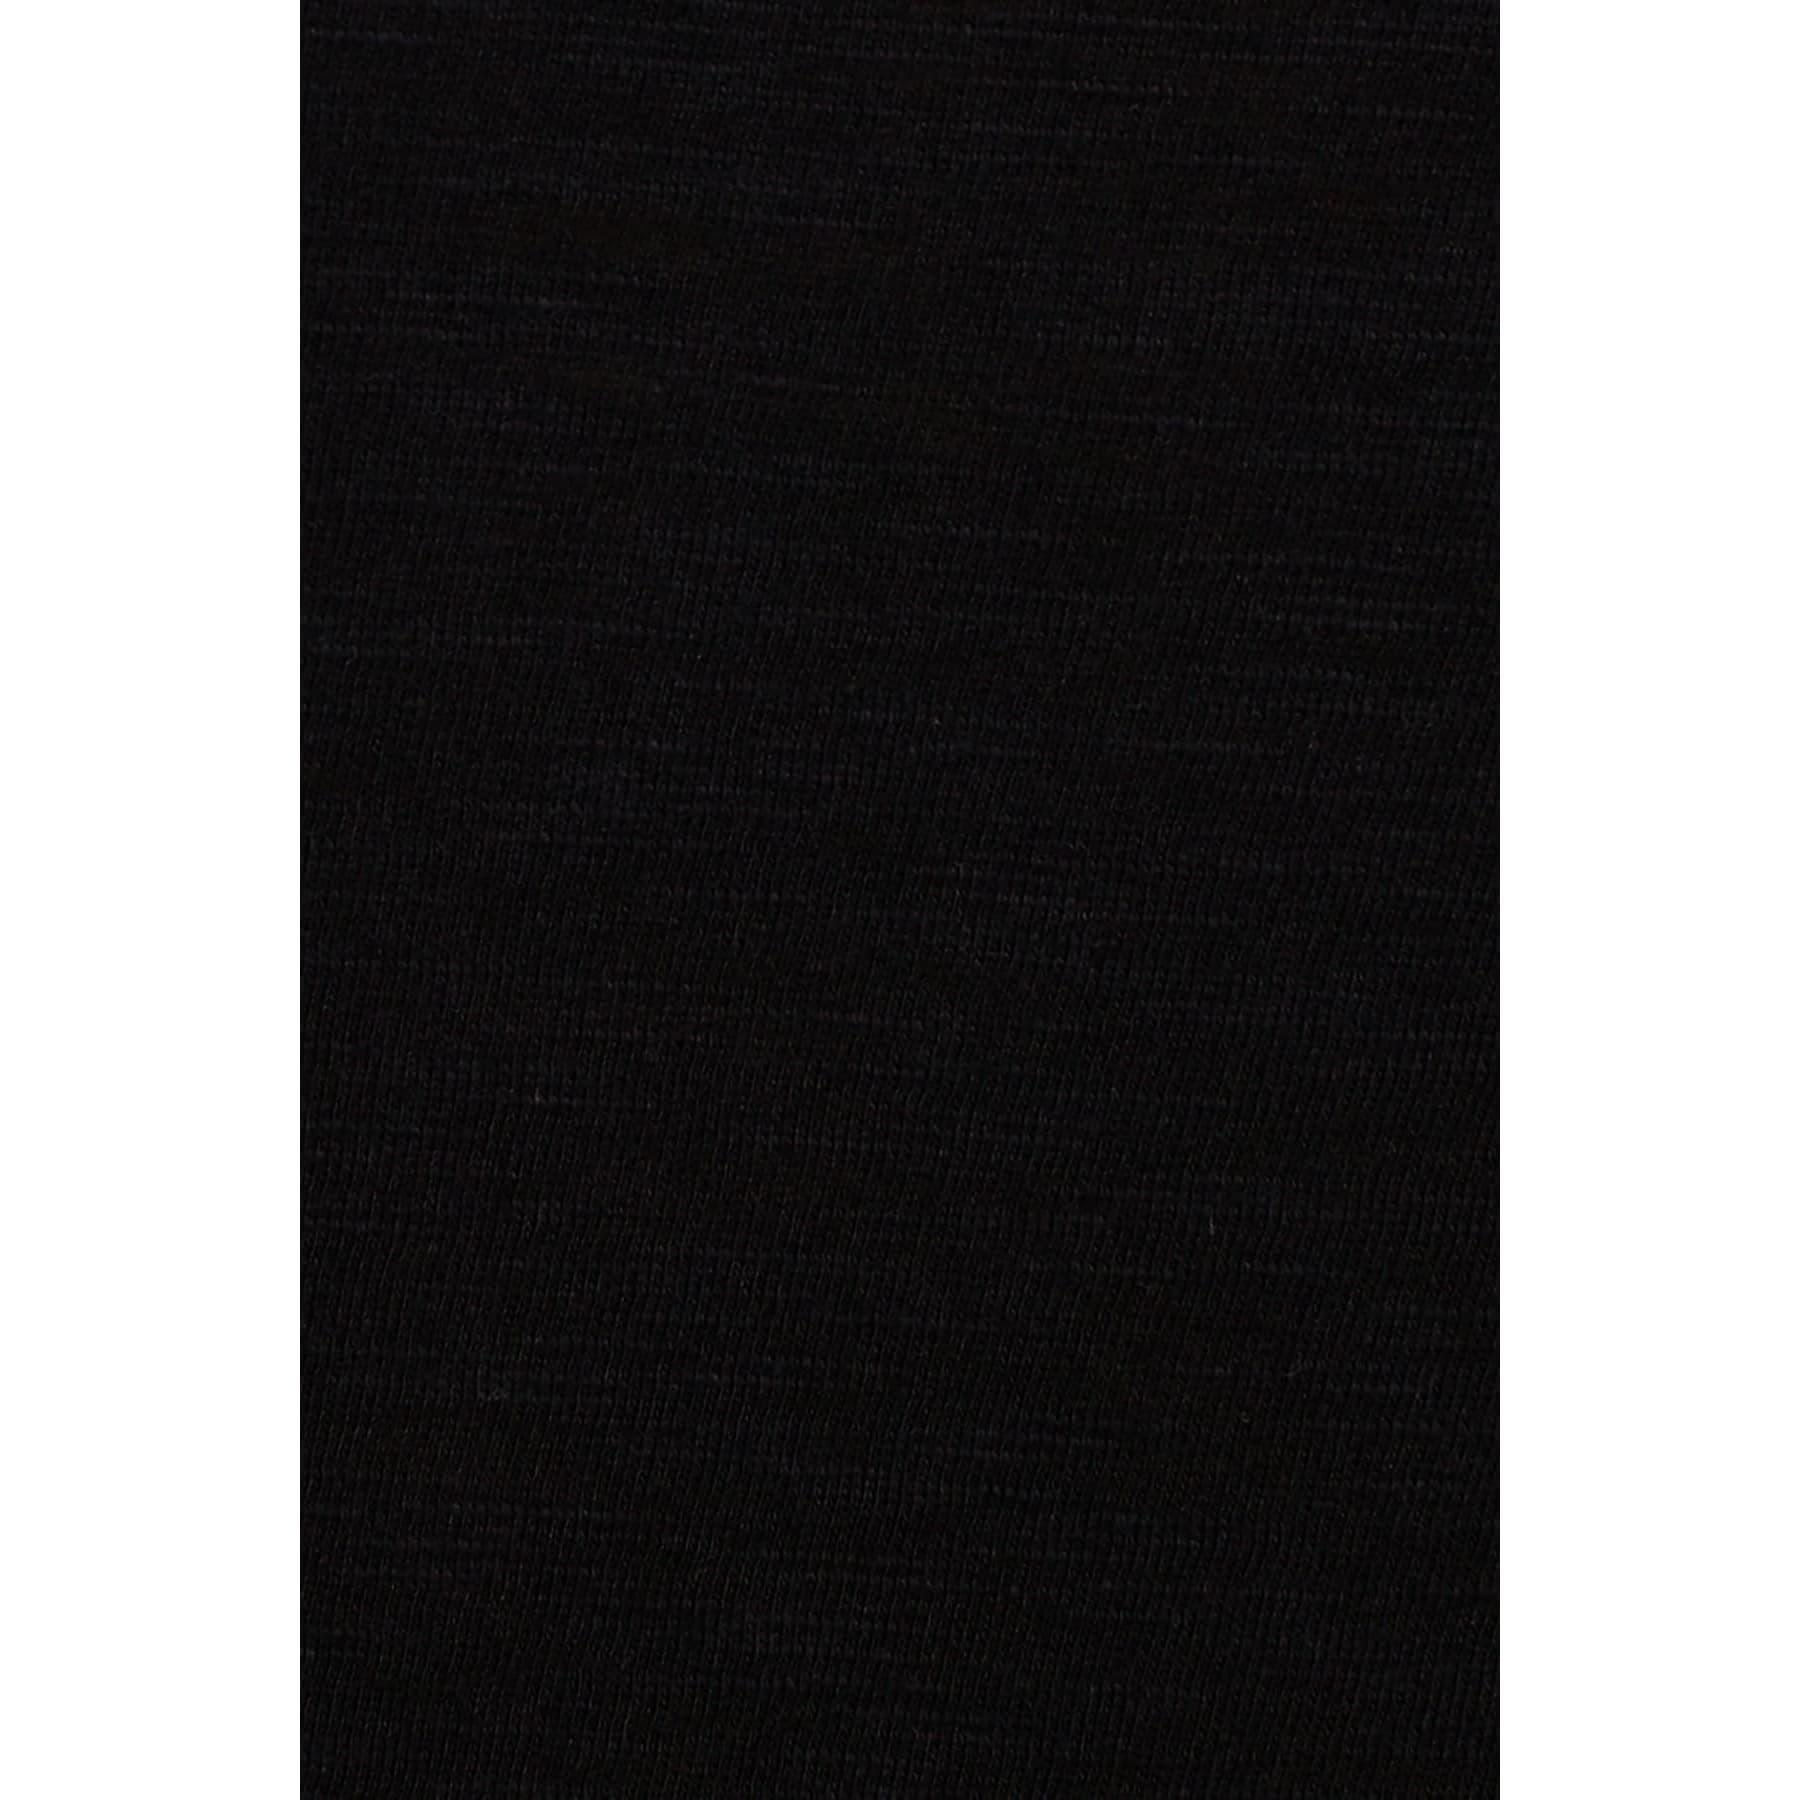 Mavi V Yaka Kadın Siyah Basic Tişört (normal kesim)